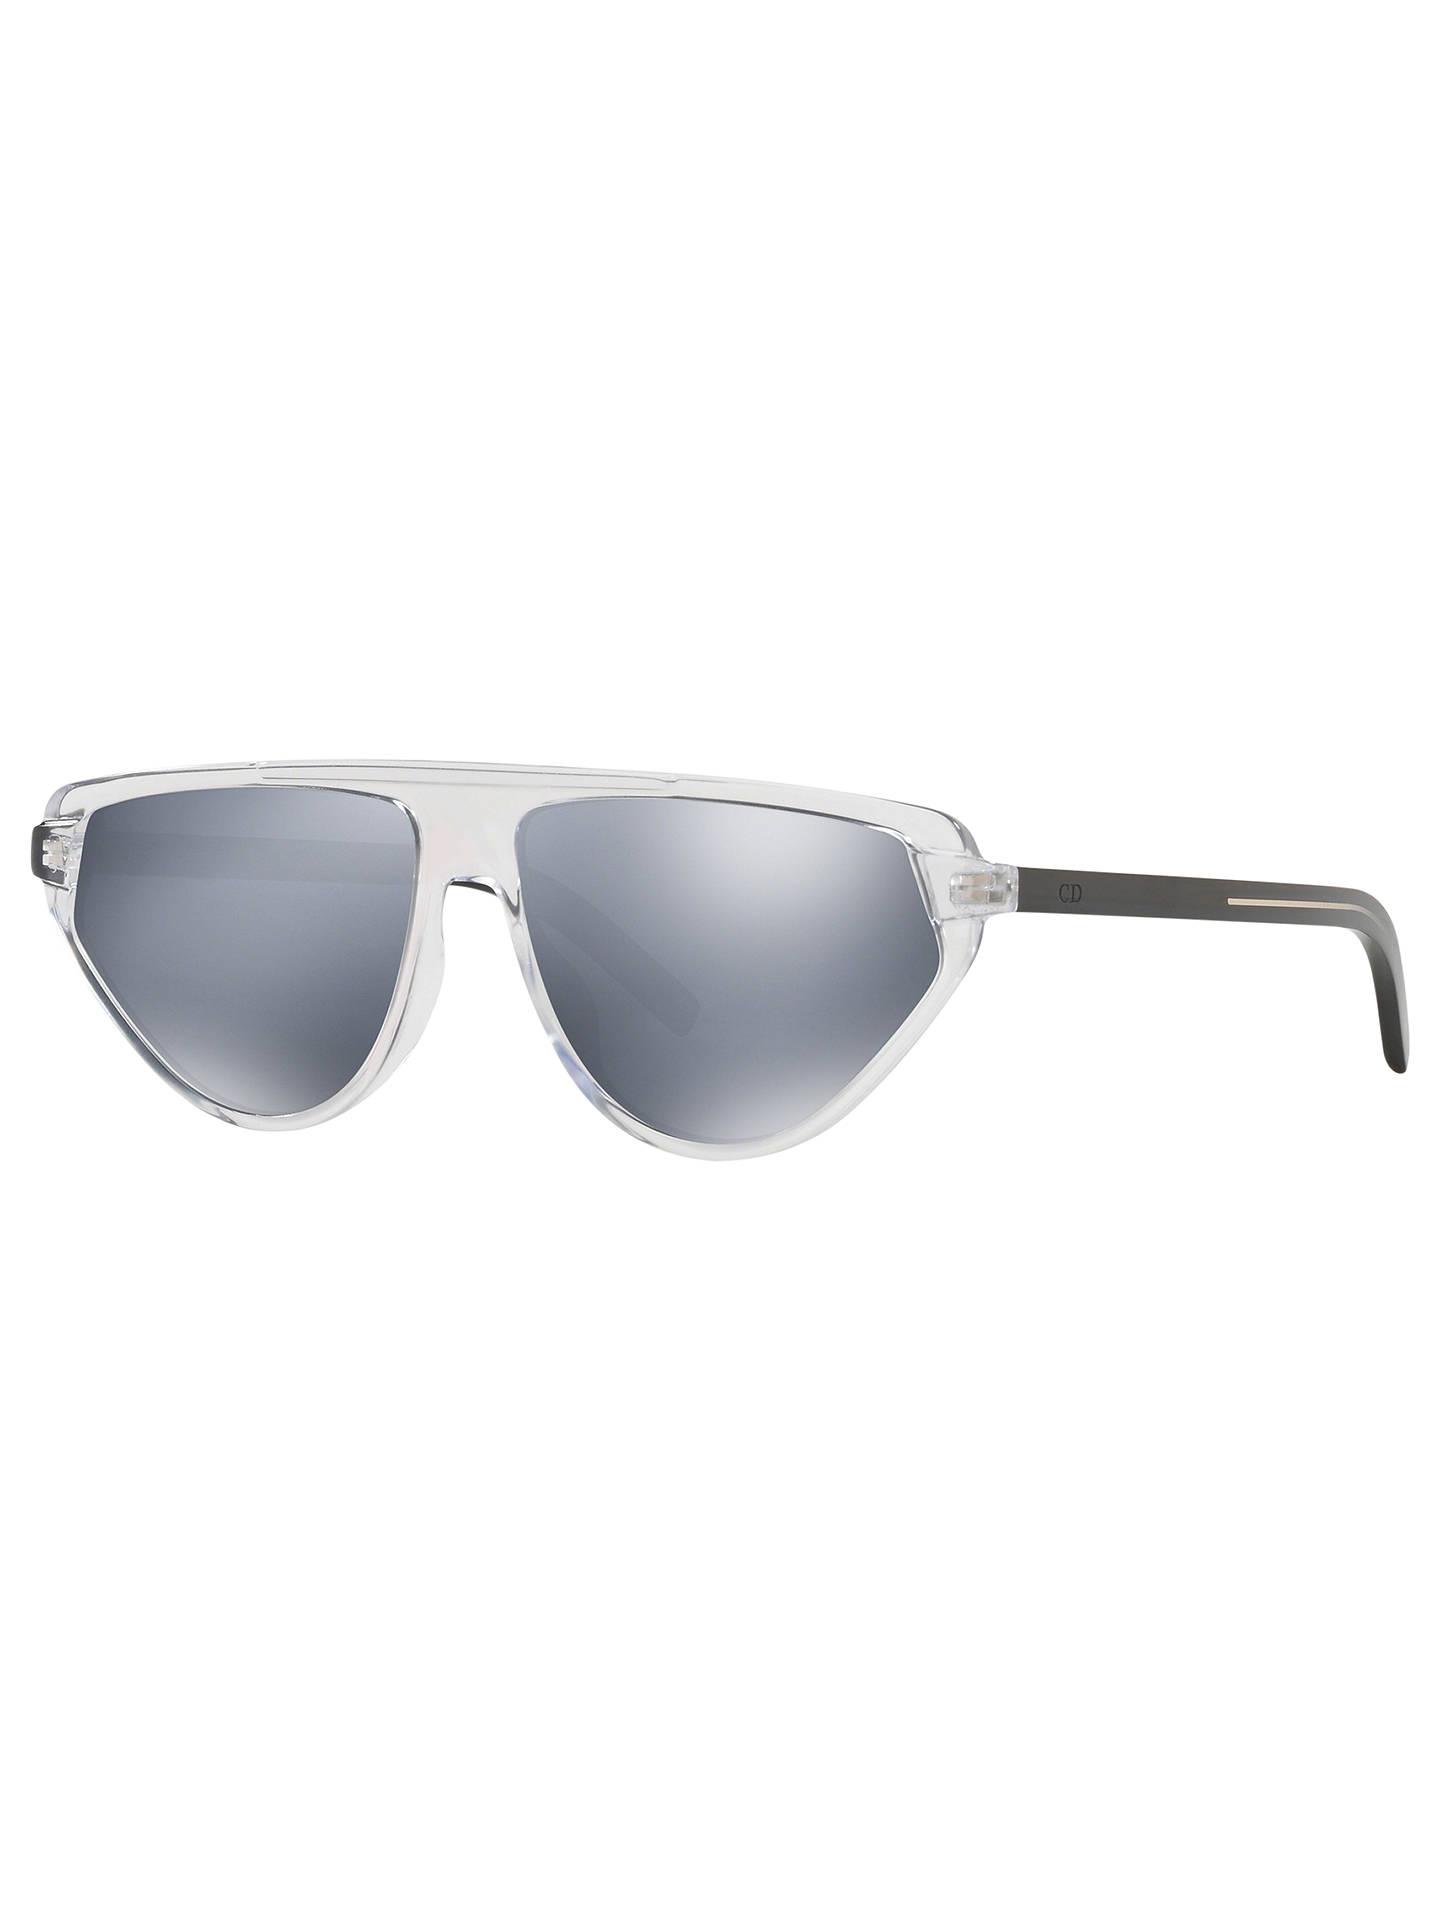 357594ffa972 Buy Dior BlackTie247S Men's Aviator Sunglasses, Clear/Mirror Grey Online at  johnlewis. ...